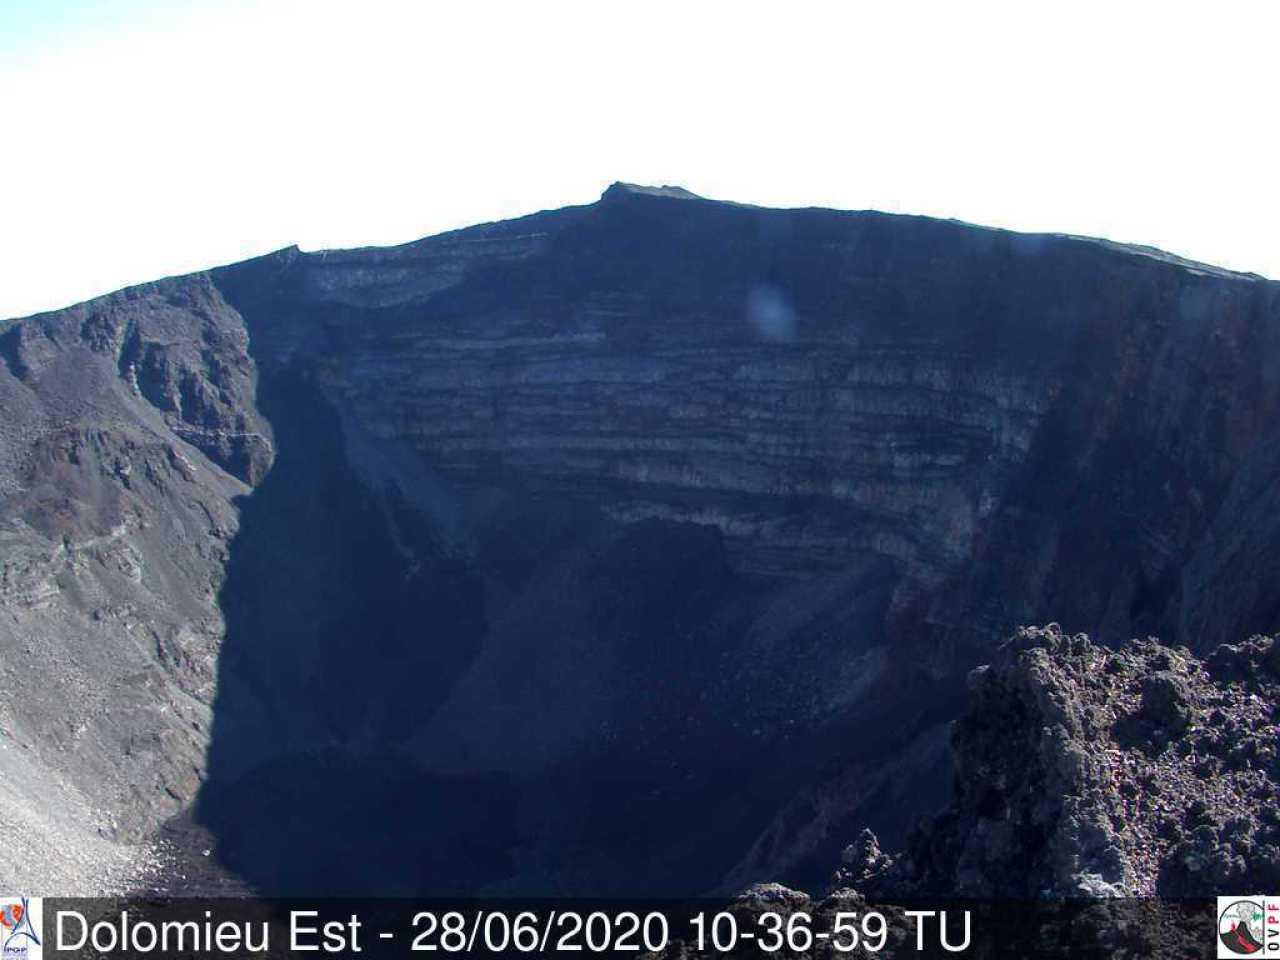 Dolomieu crater at Piton de la Fournaise volcano on 28 June (image: OVPF)